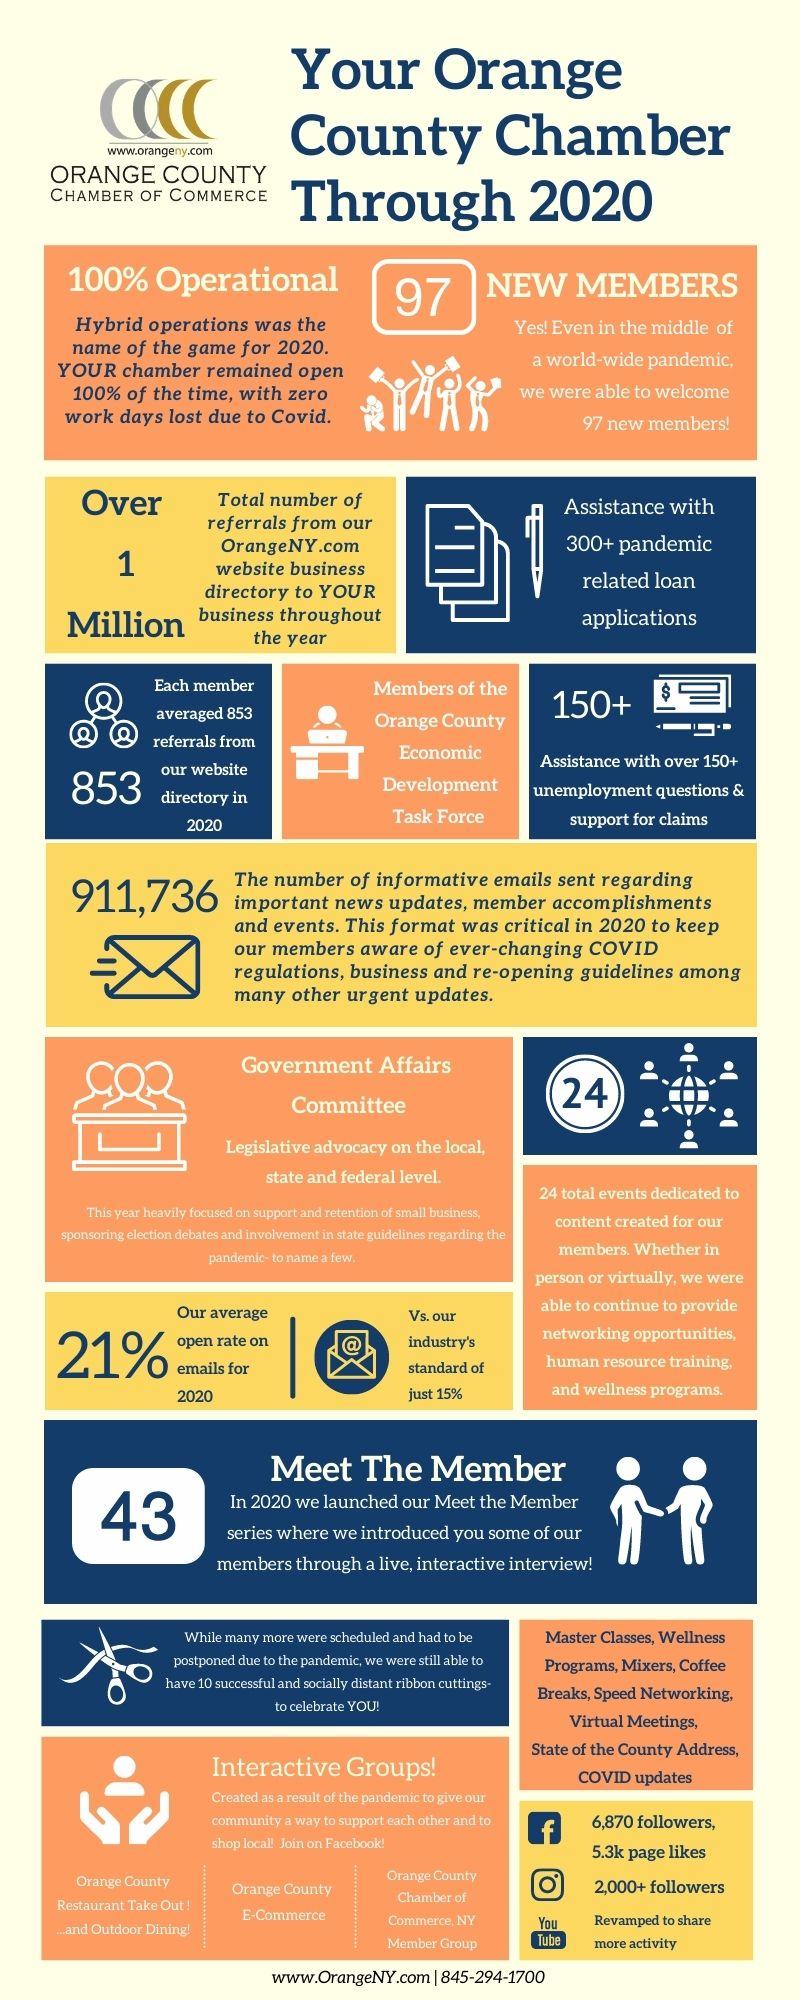 Orange County Chamber of Commerce 2020 Accomplishments